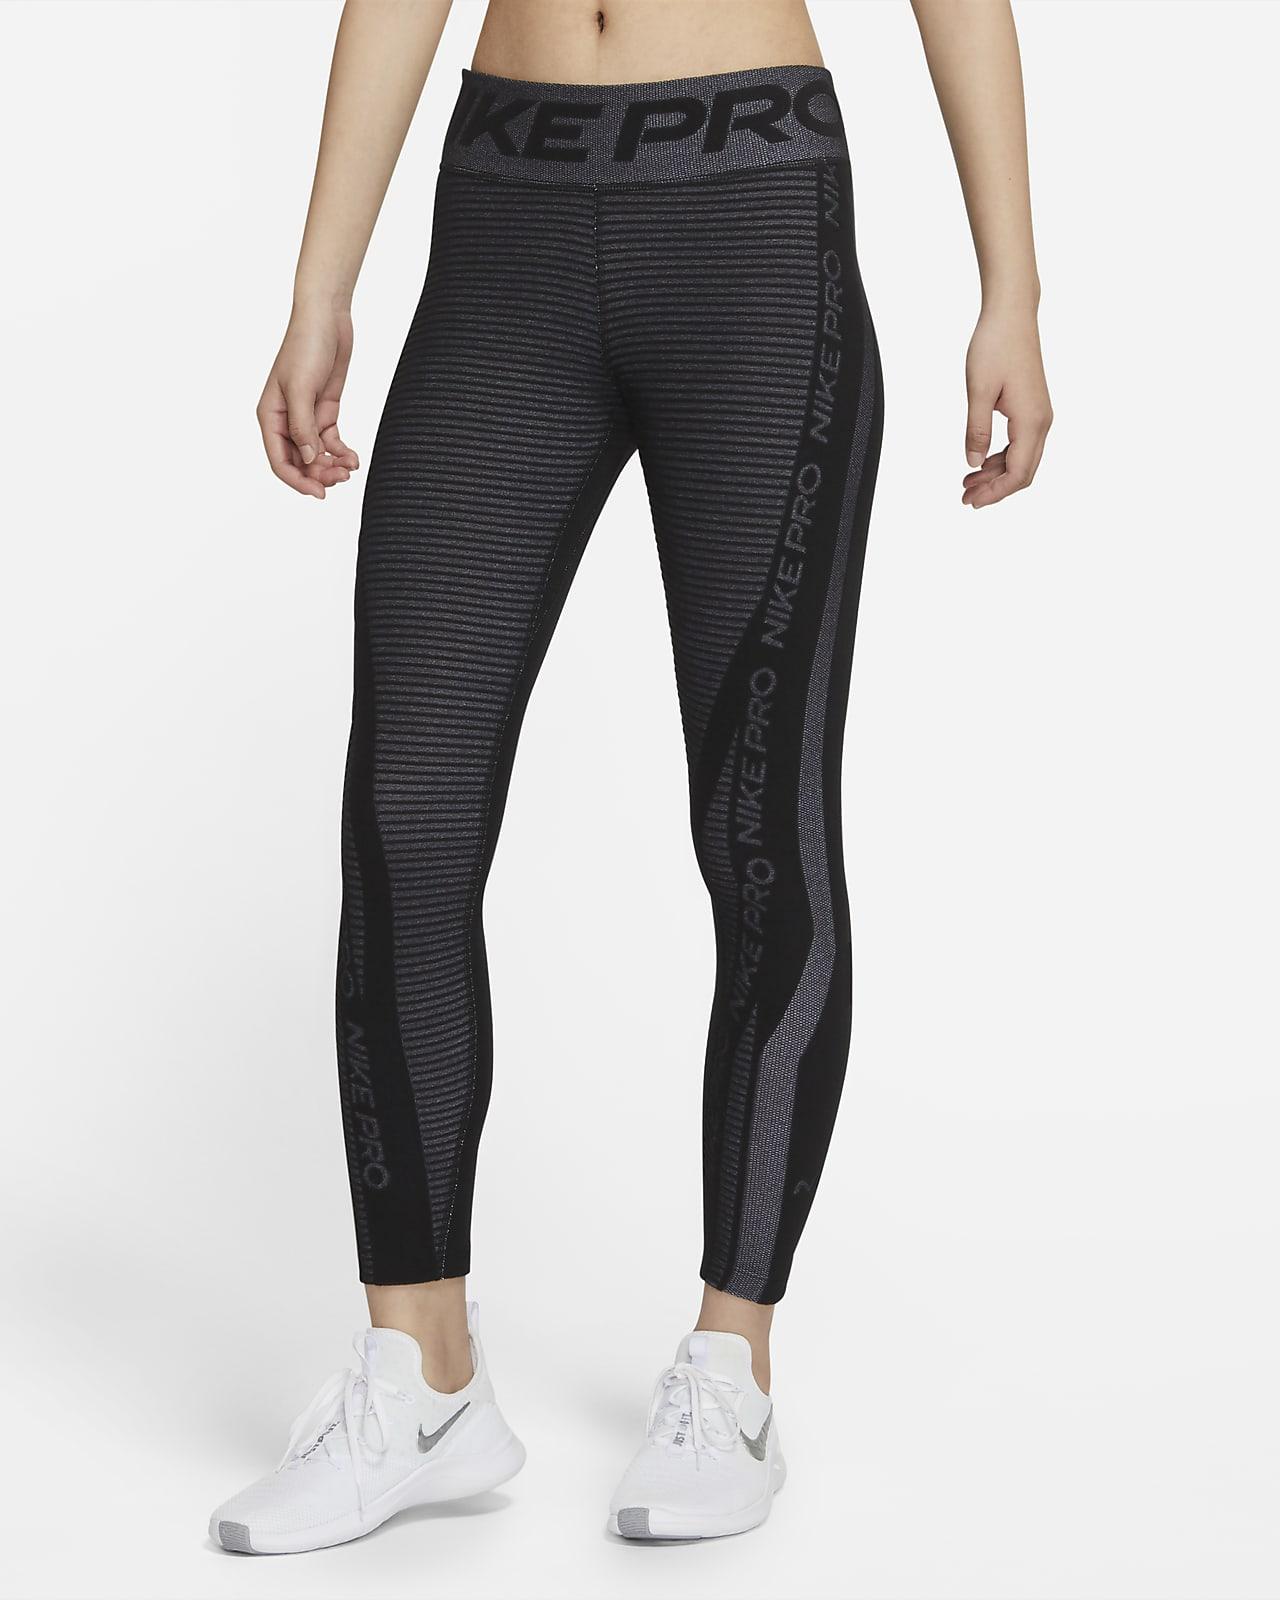 Tights de treino Nike Pro HyperWarm para mulher